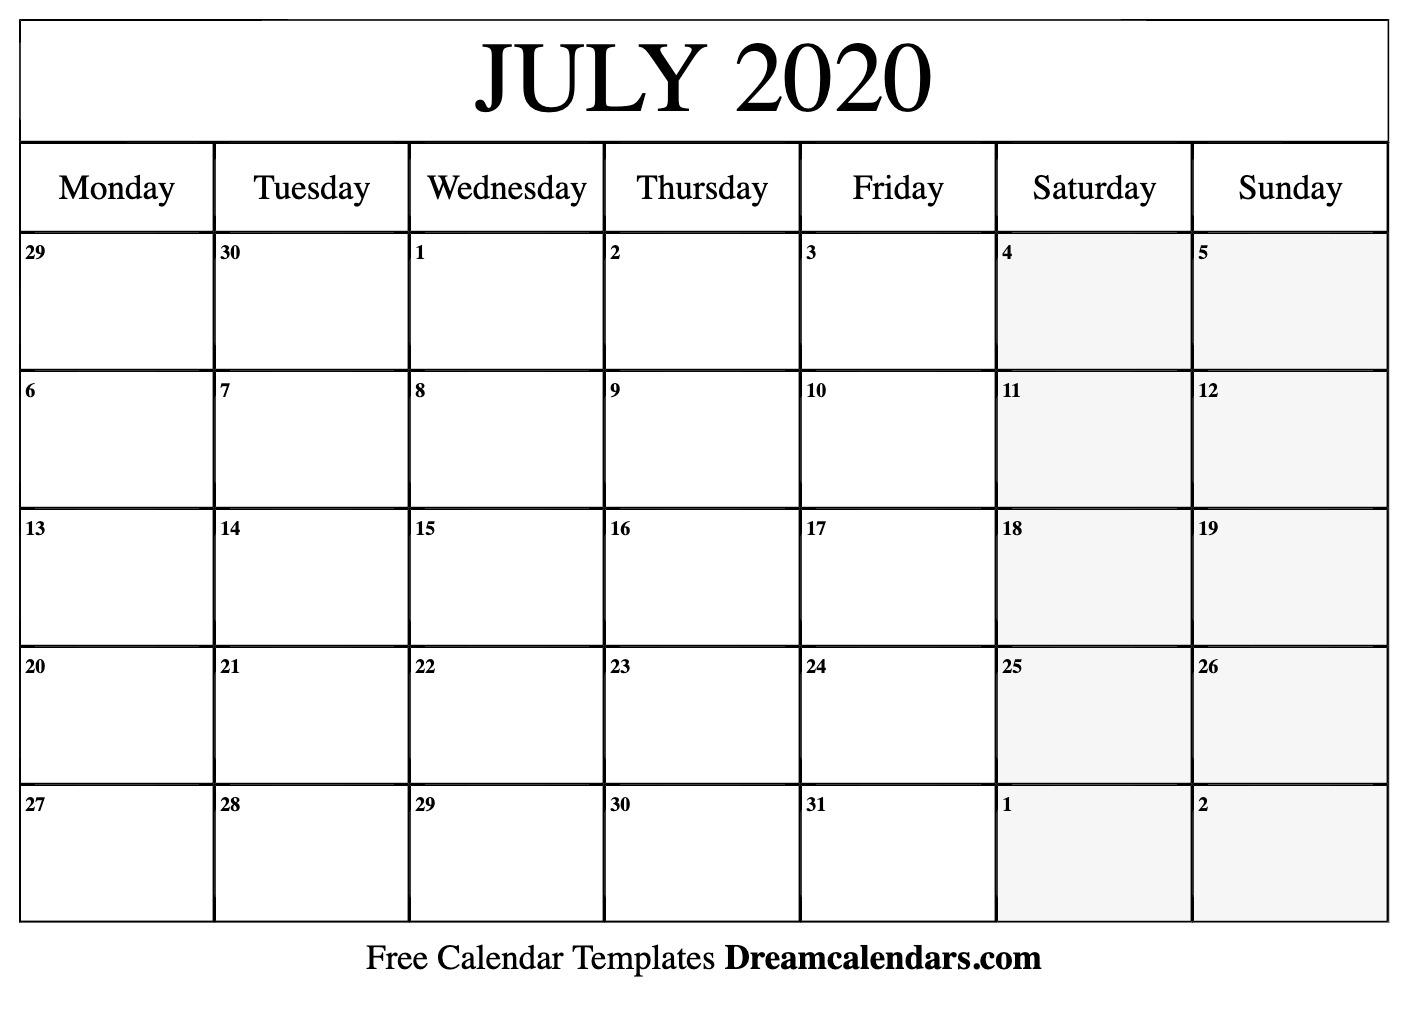 Calendar Printable July 2020 - Tunu.redmini.co